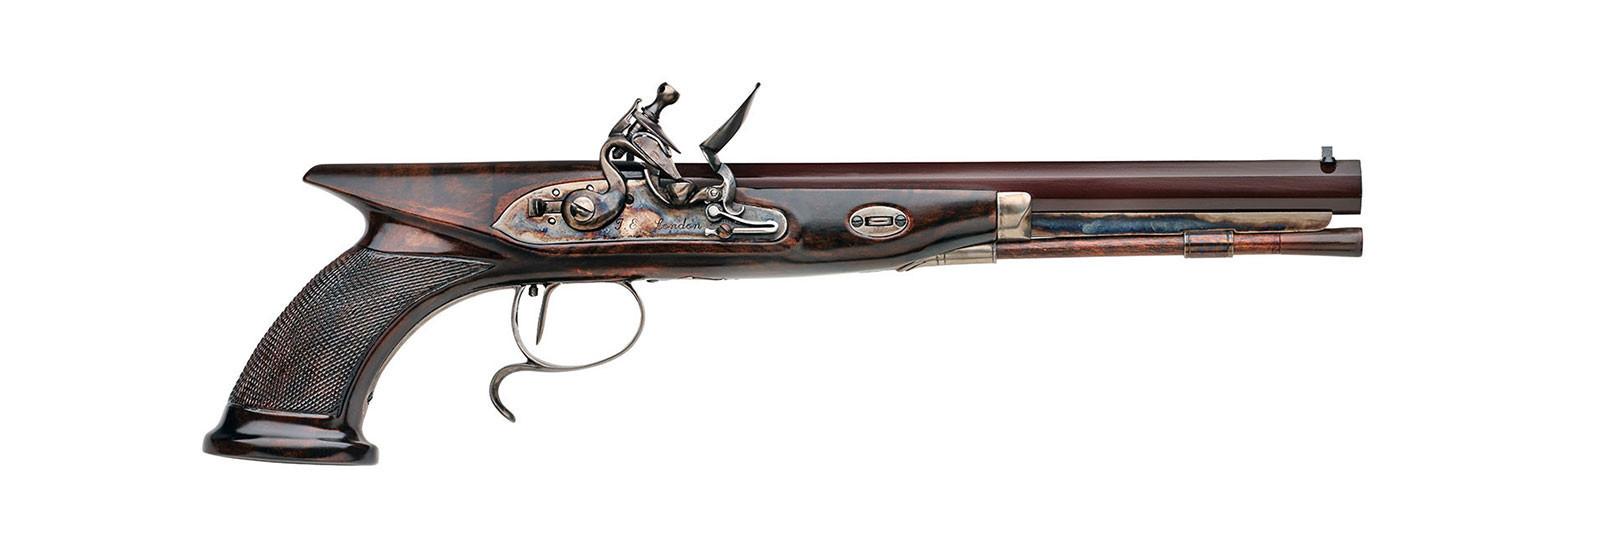 Tatham & egg pistol.45 smooth